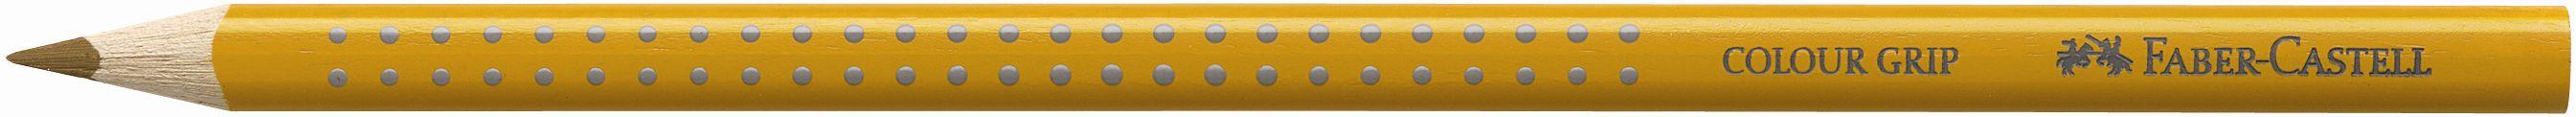 Pastelka Color Grip / 283 pálená siena Faber Castell - Akvarelové pastelky Faber Castell - Akvarelové pastelky